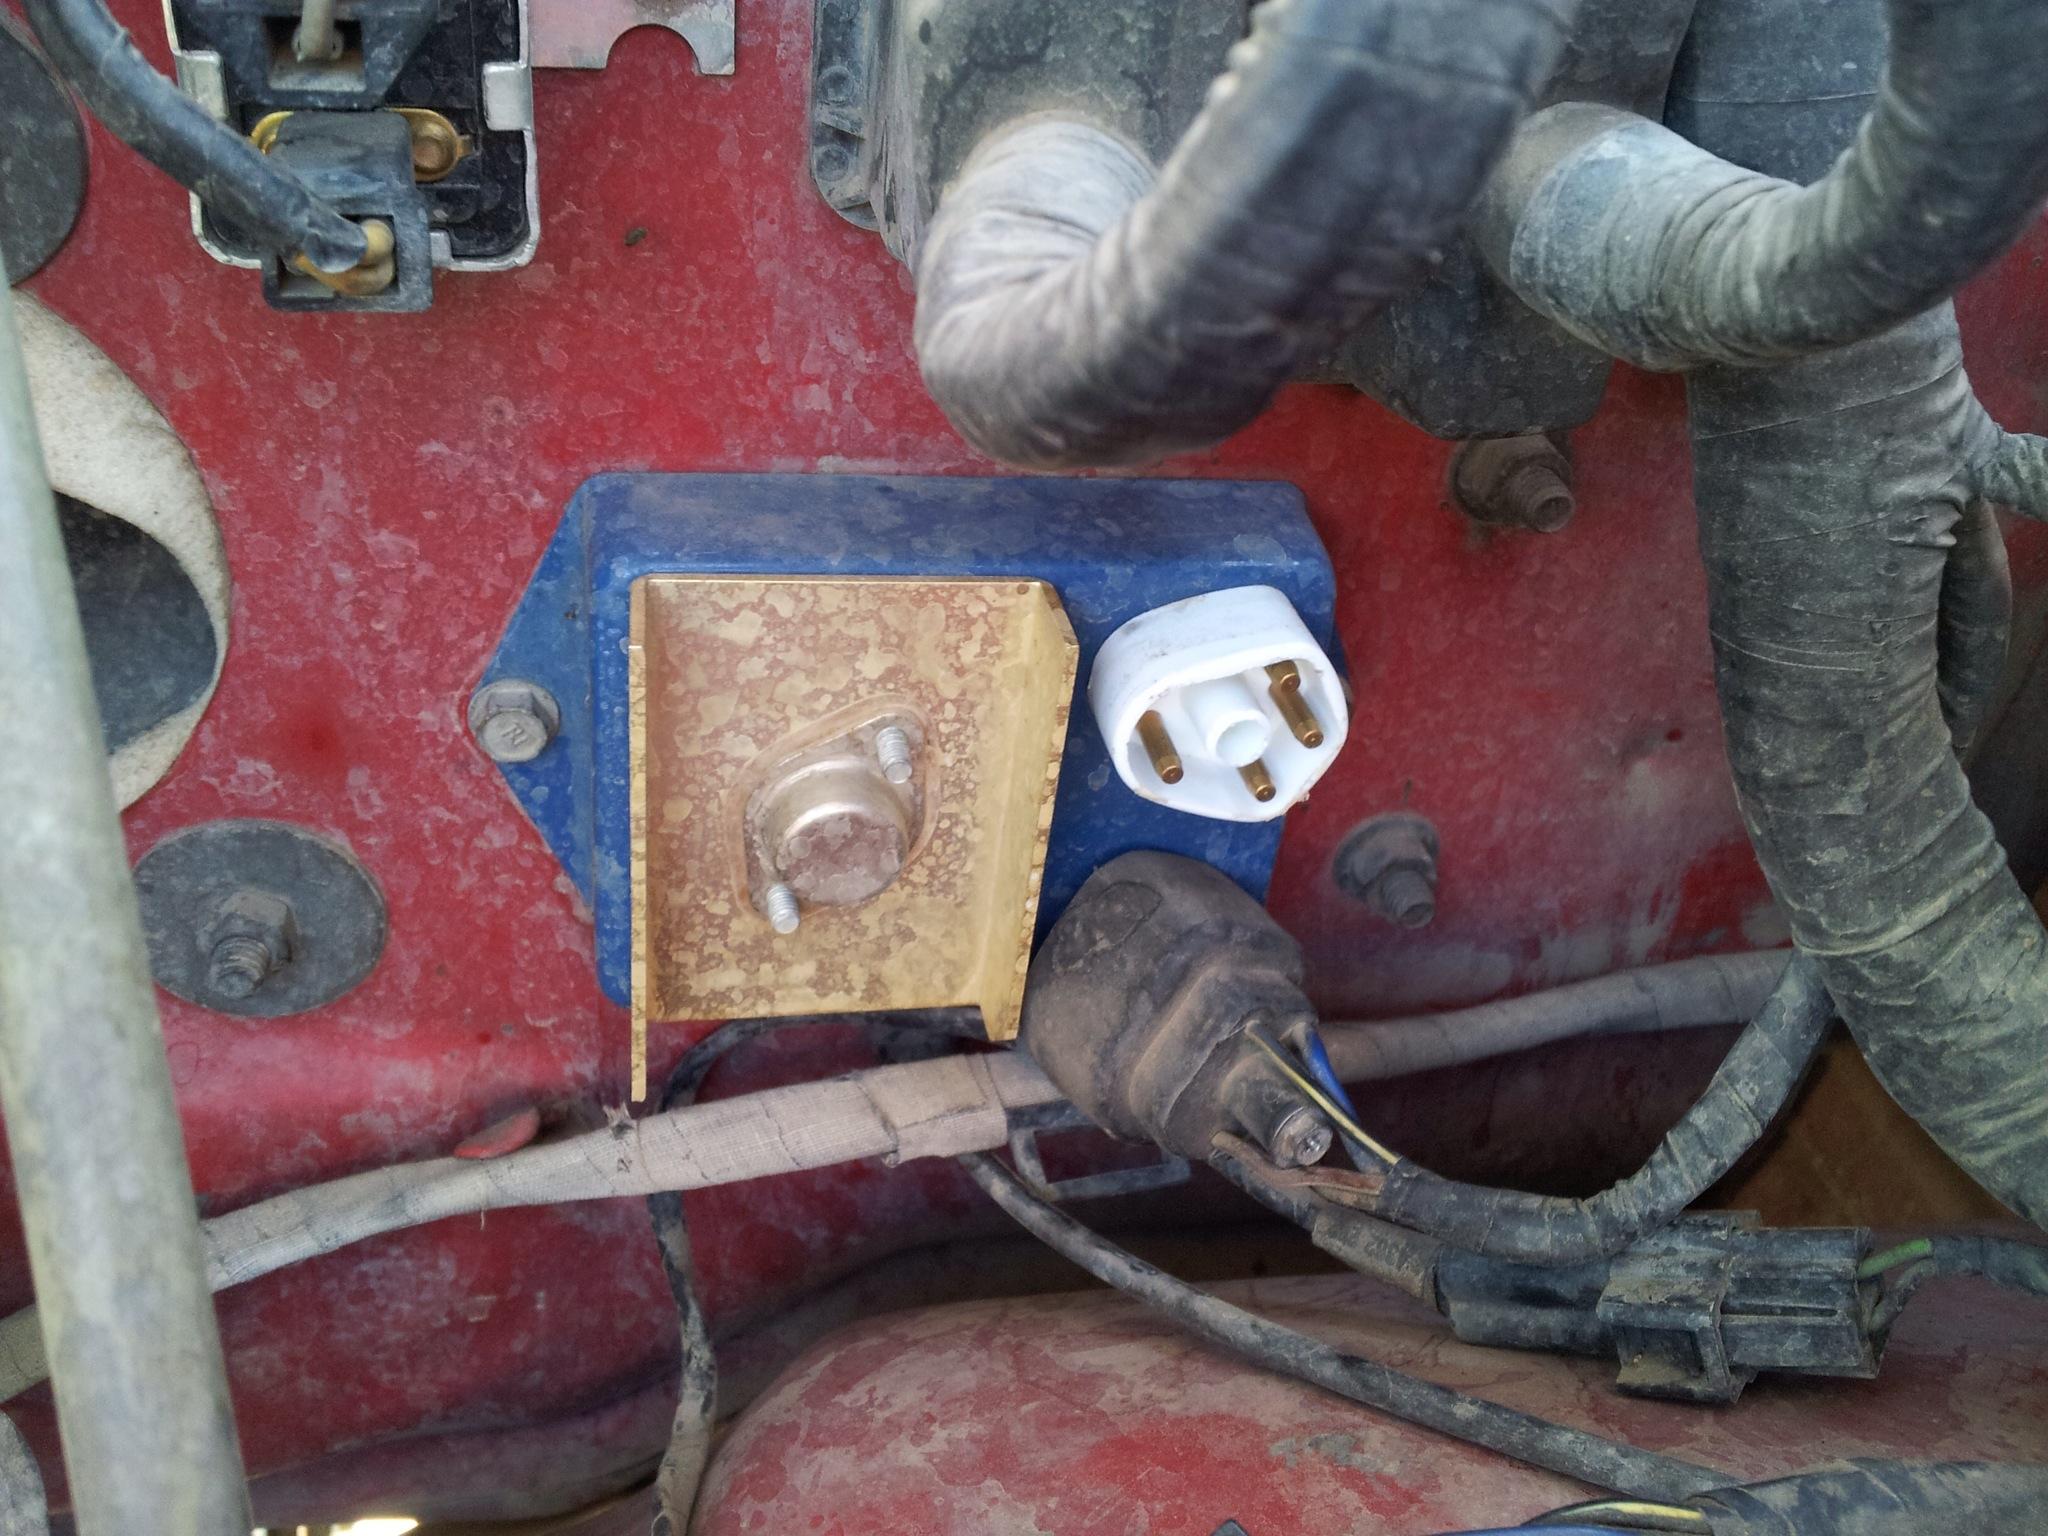 Msd Rpm Switch Wiring Diagram Ballast Resistor Dodge Ram Ramcharger Cummins Jeep